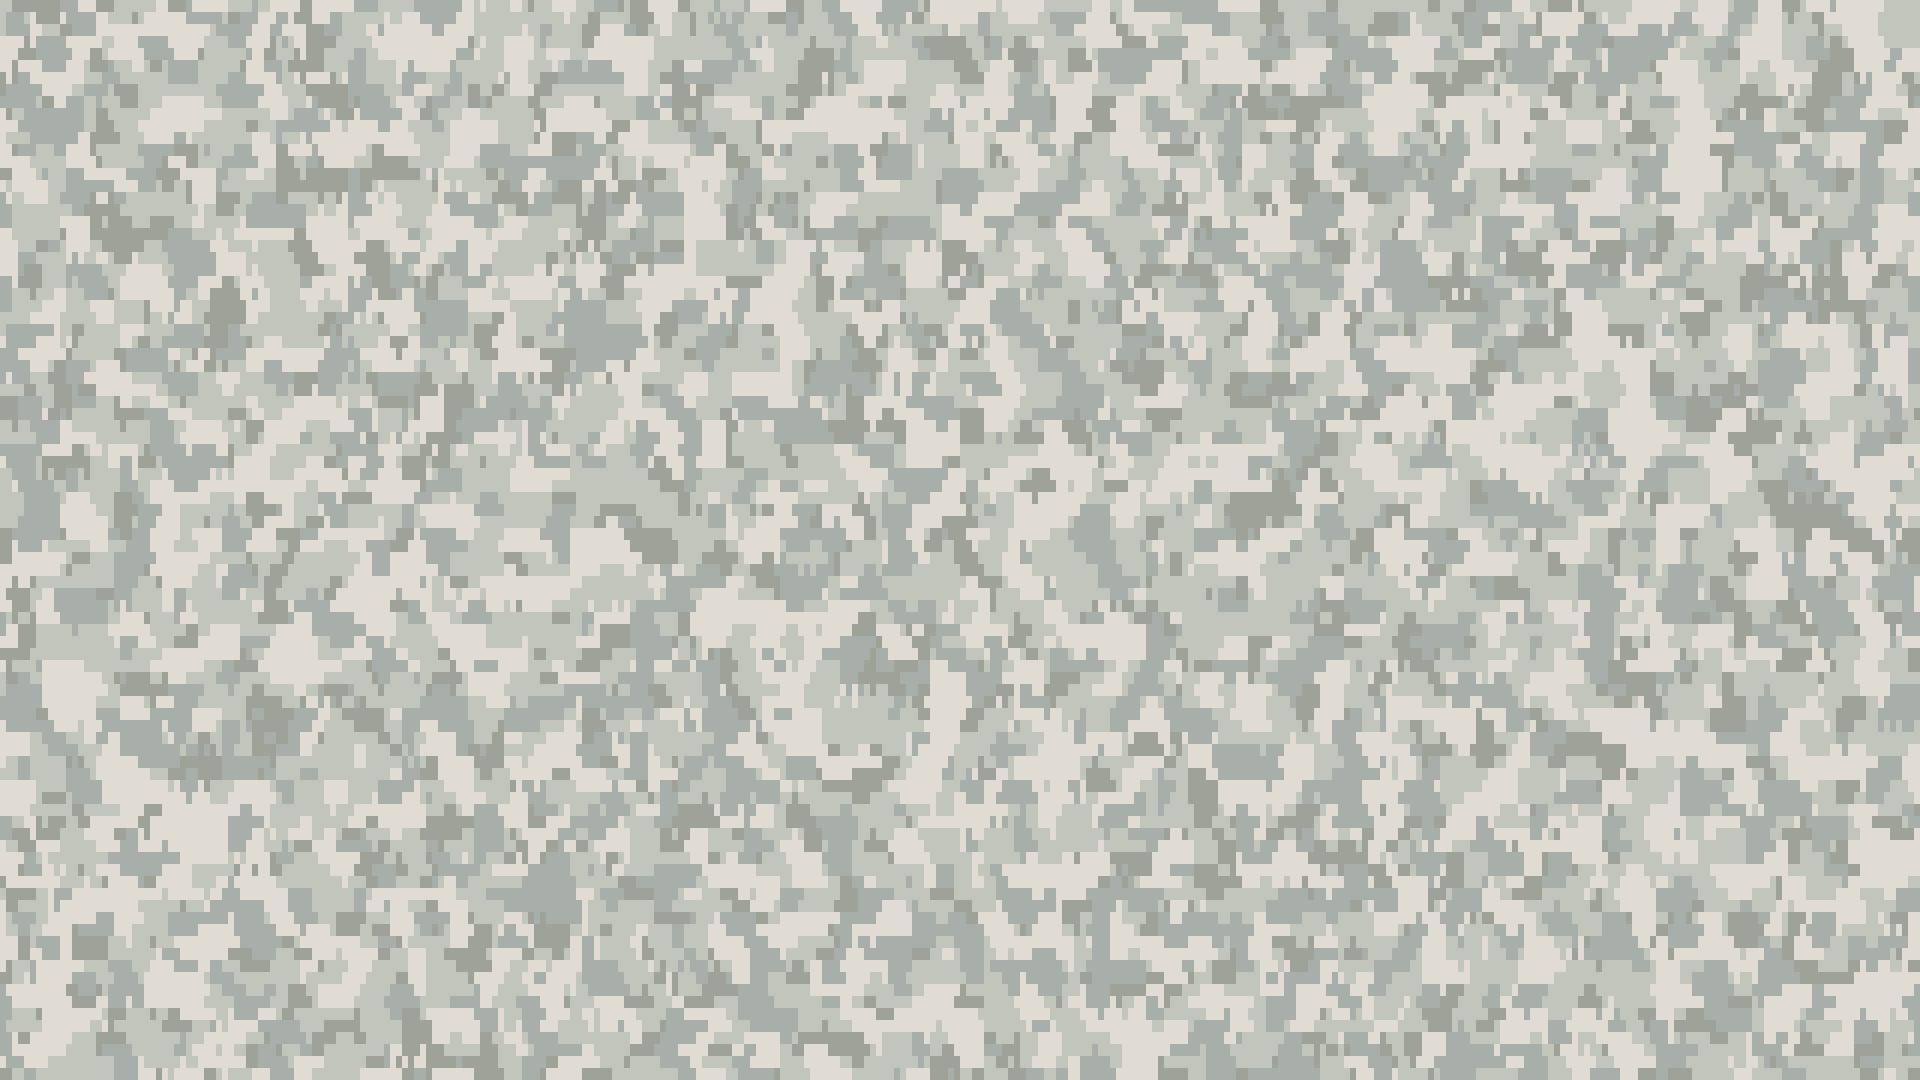 Army camo wallpaper hd wallpaper hd digital camo viewing gallery army 1920x1080